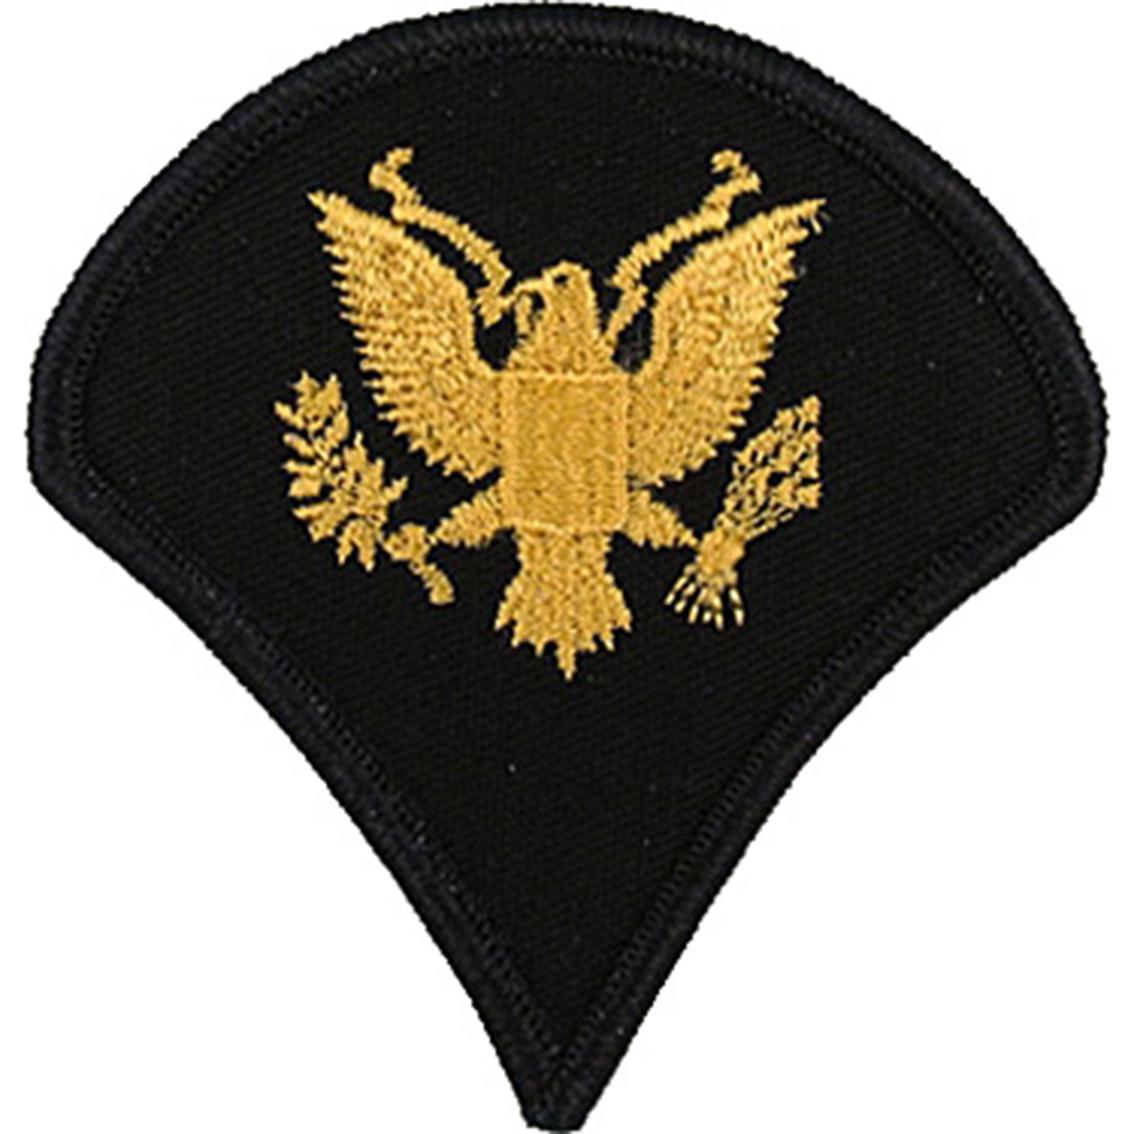 Army Rank Spc Large Asu Sew-on | Large Asu Rank | Military | Shop